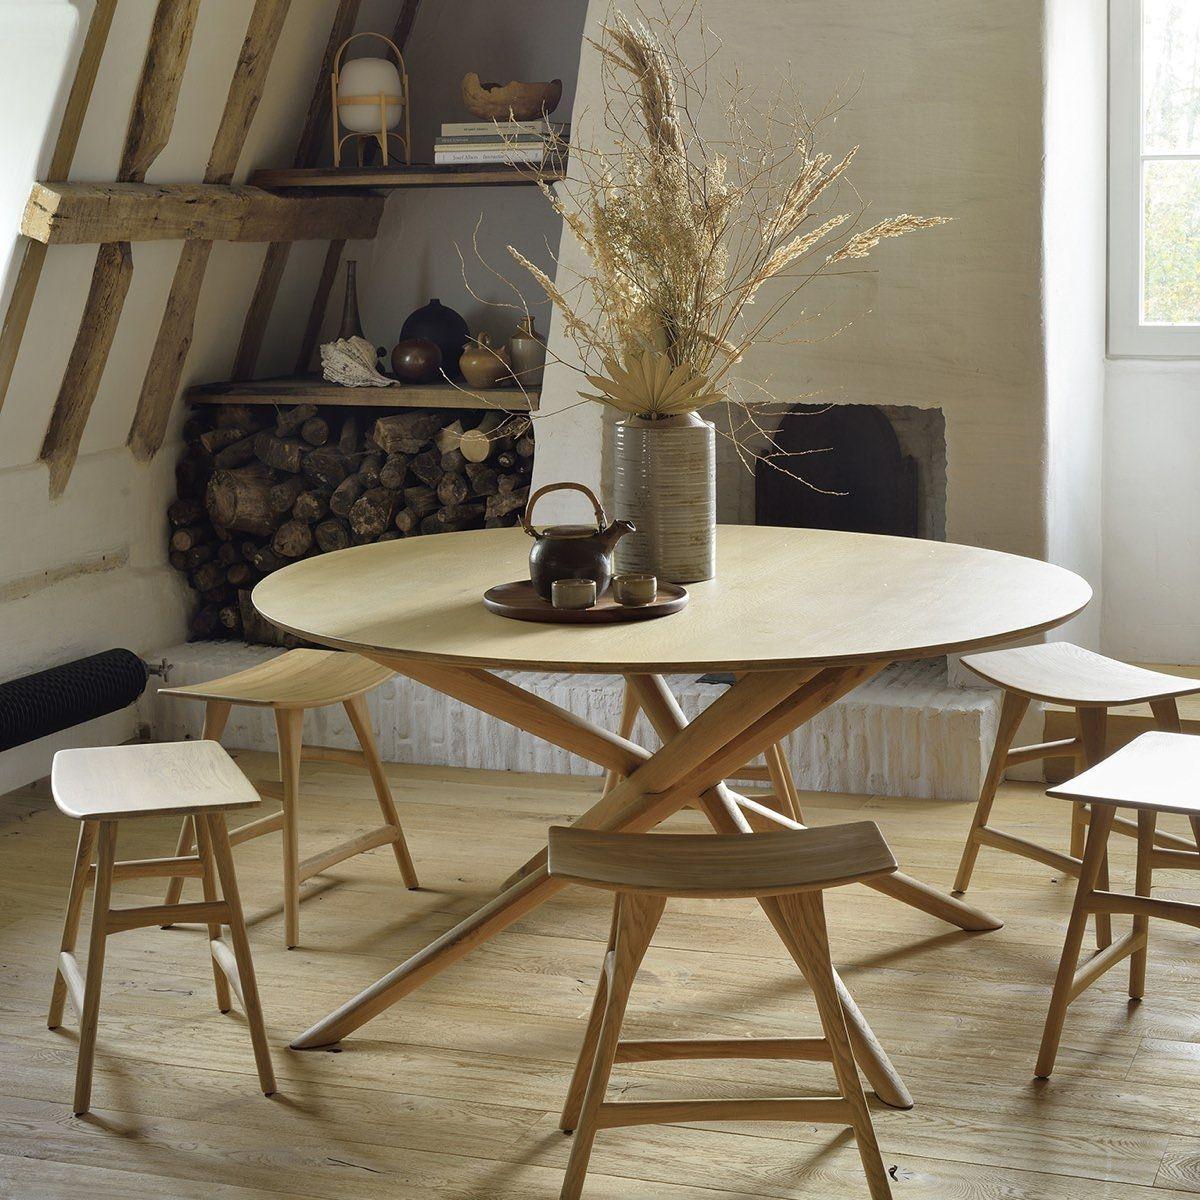 Ethnicraft Mikado Dining Table - Round